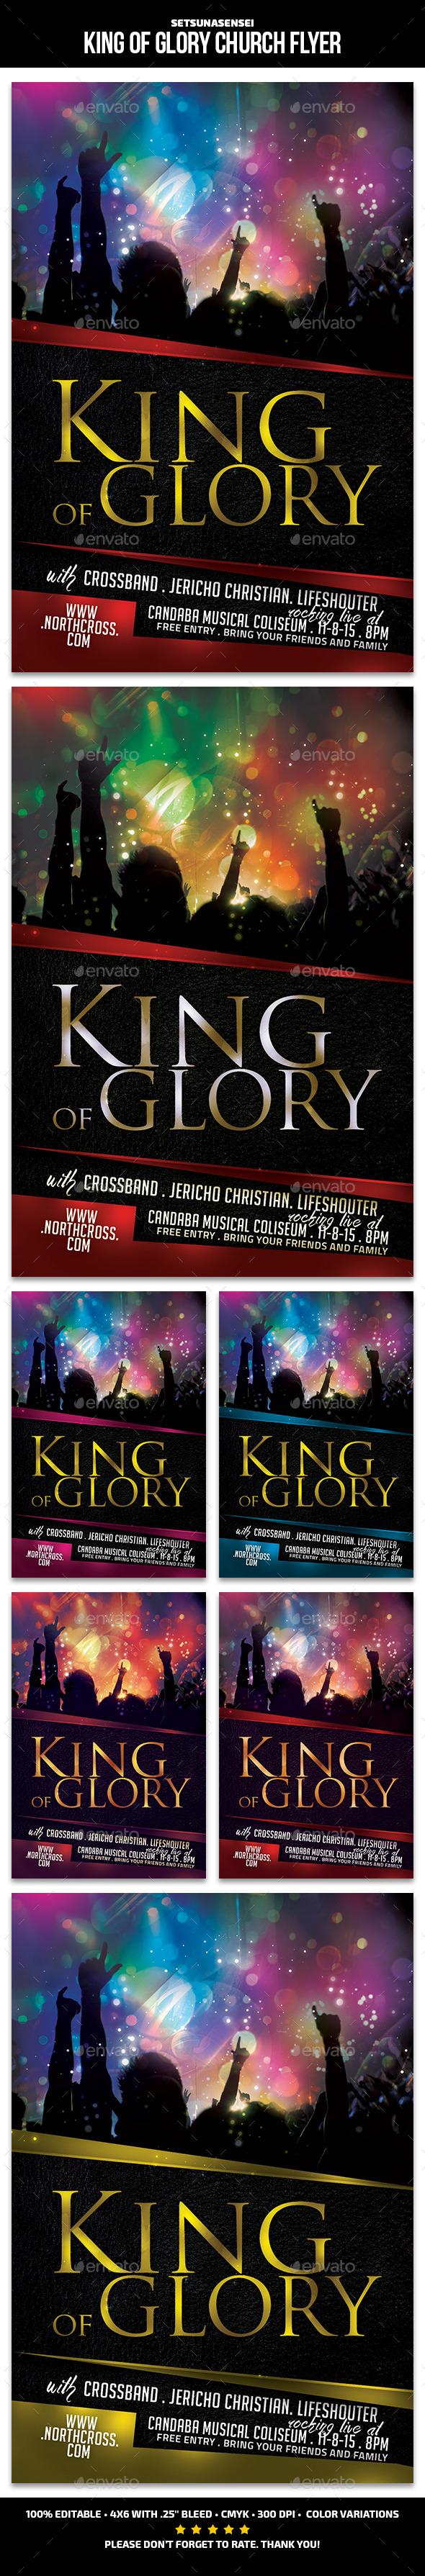 King of Glory Church Flyer - Church Flyers